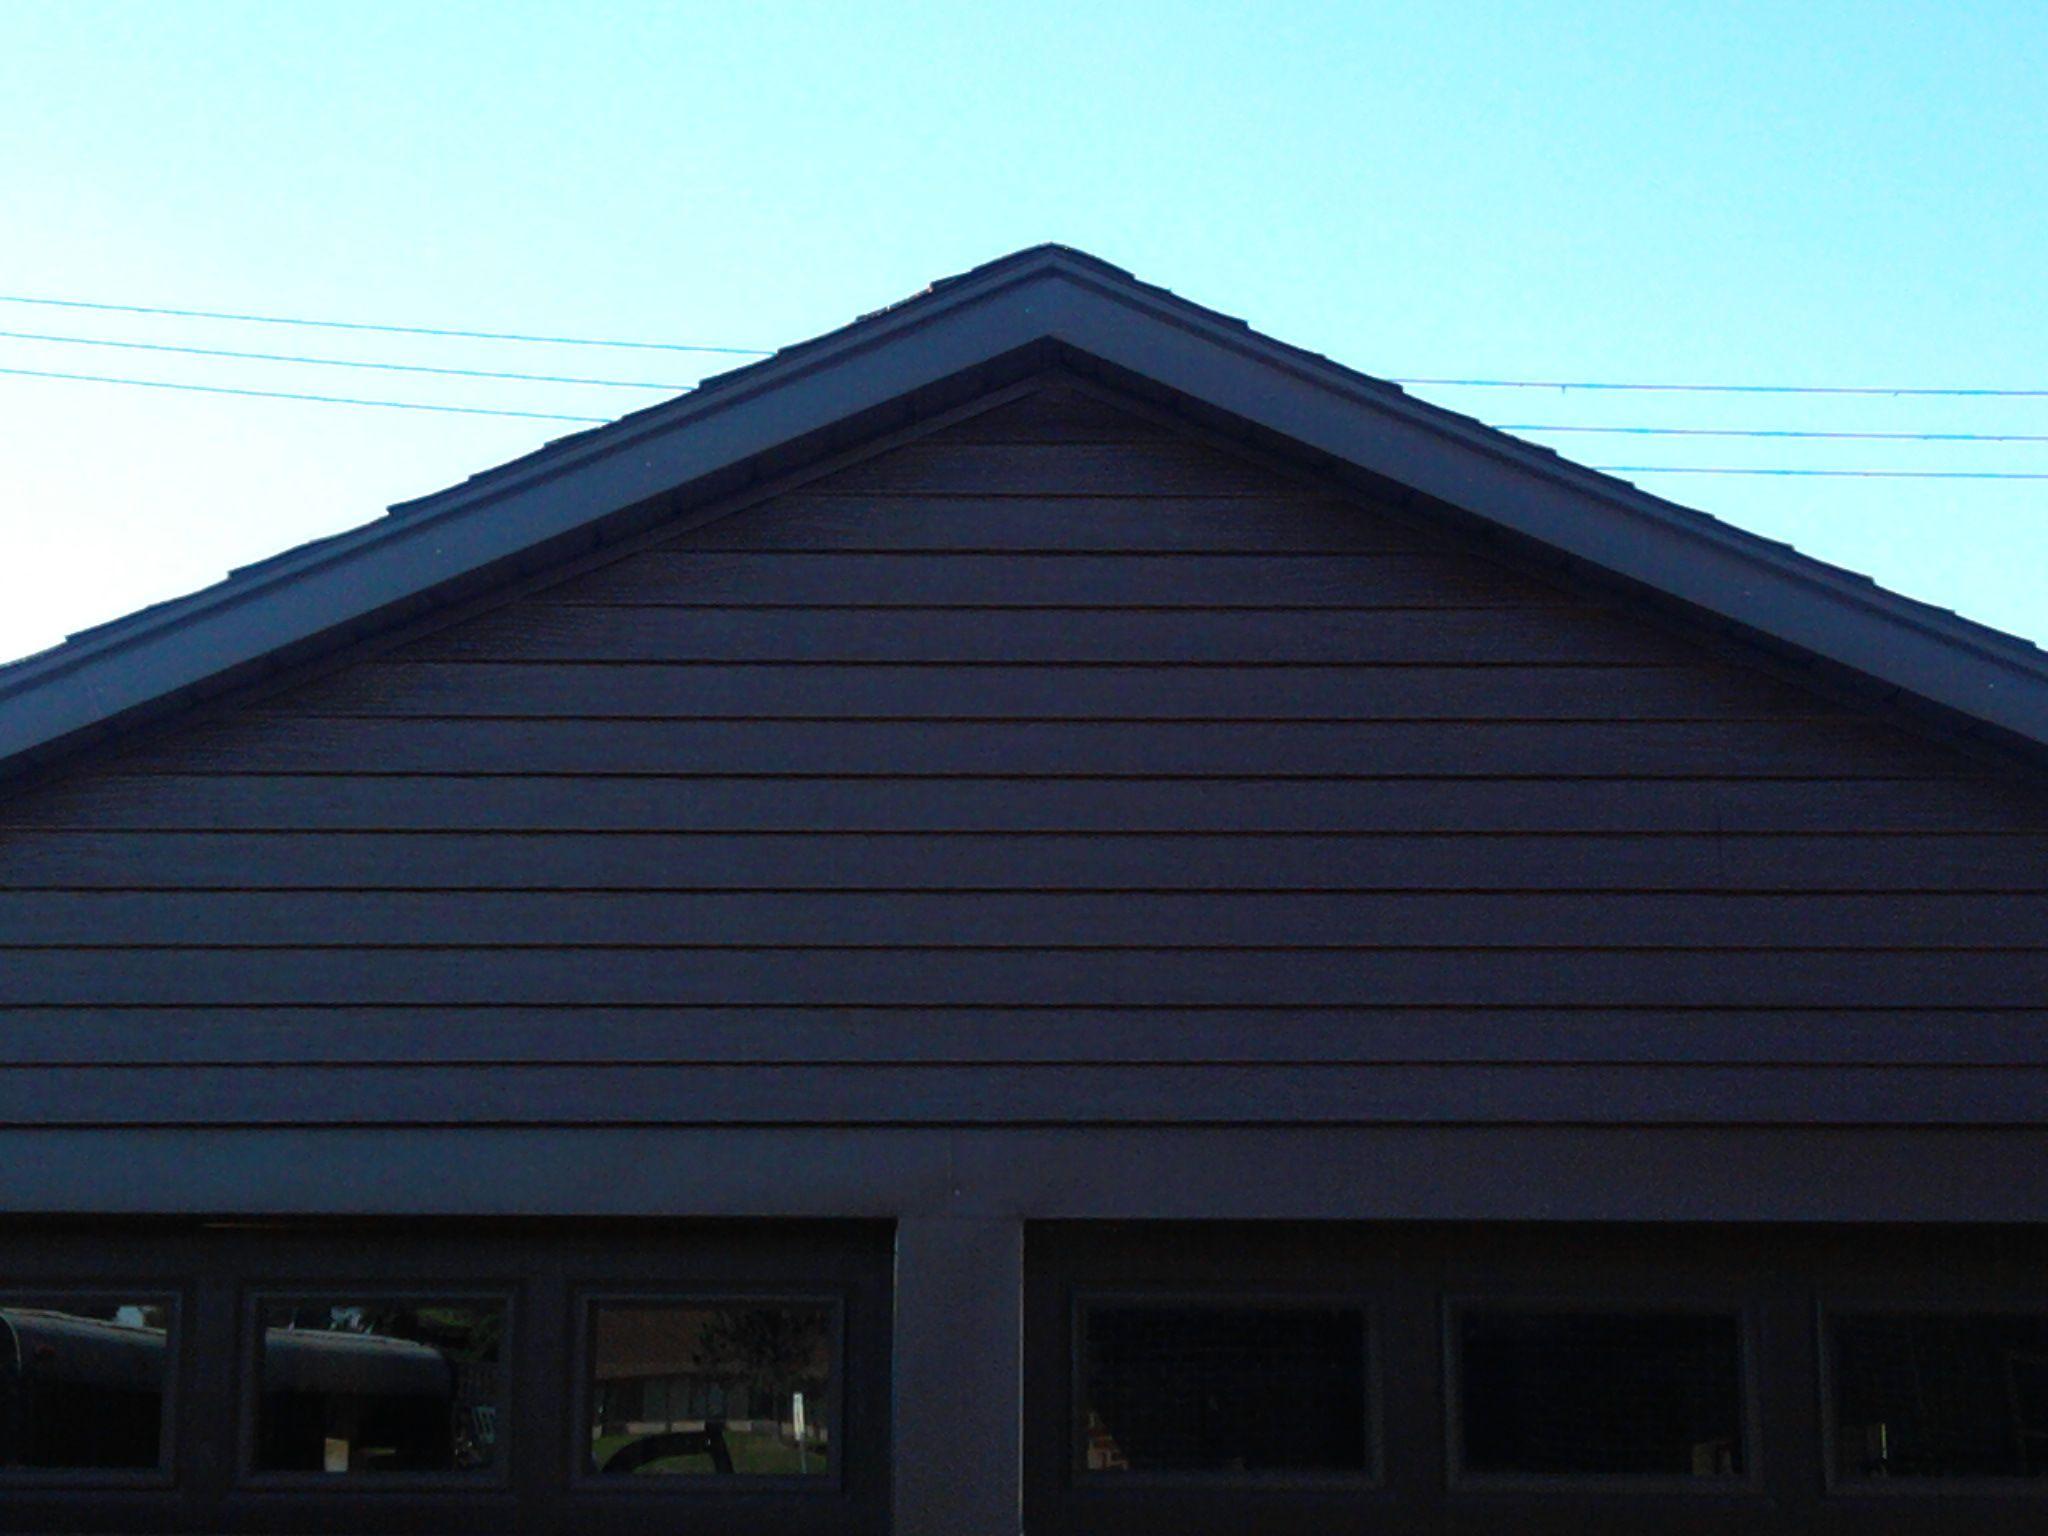 Rollex Brown Steel Siding House Siding Steel Siding Outdoor Decor